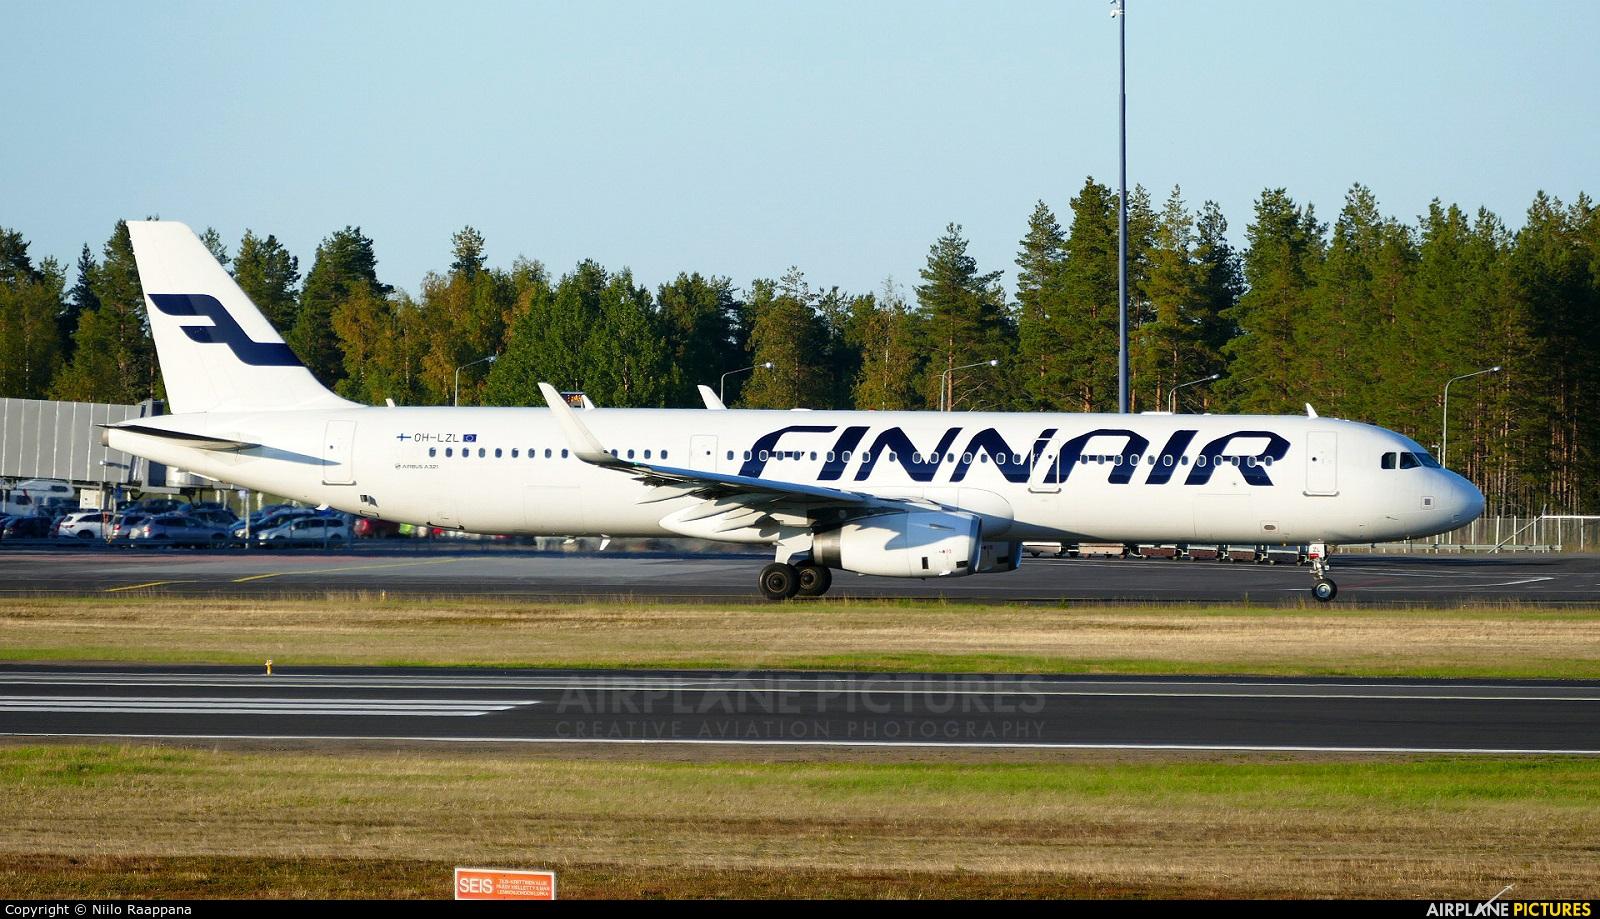 Finnair OH-LZL aircraft at Oulu